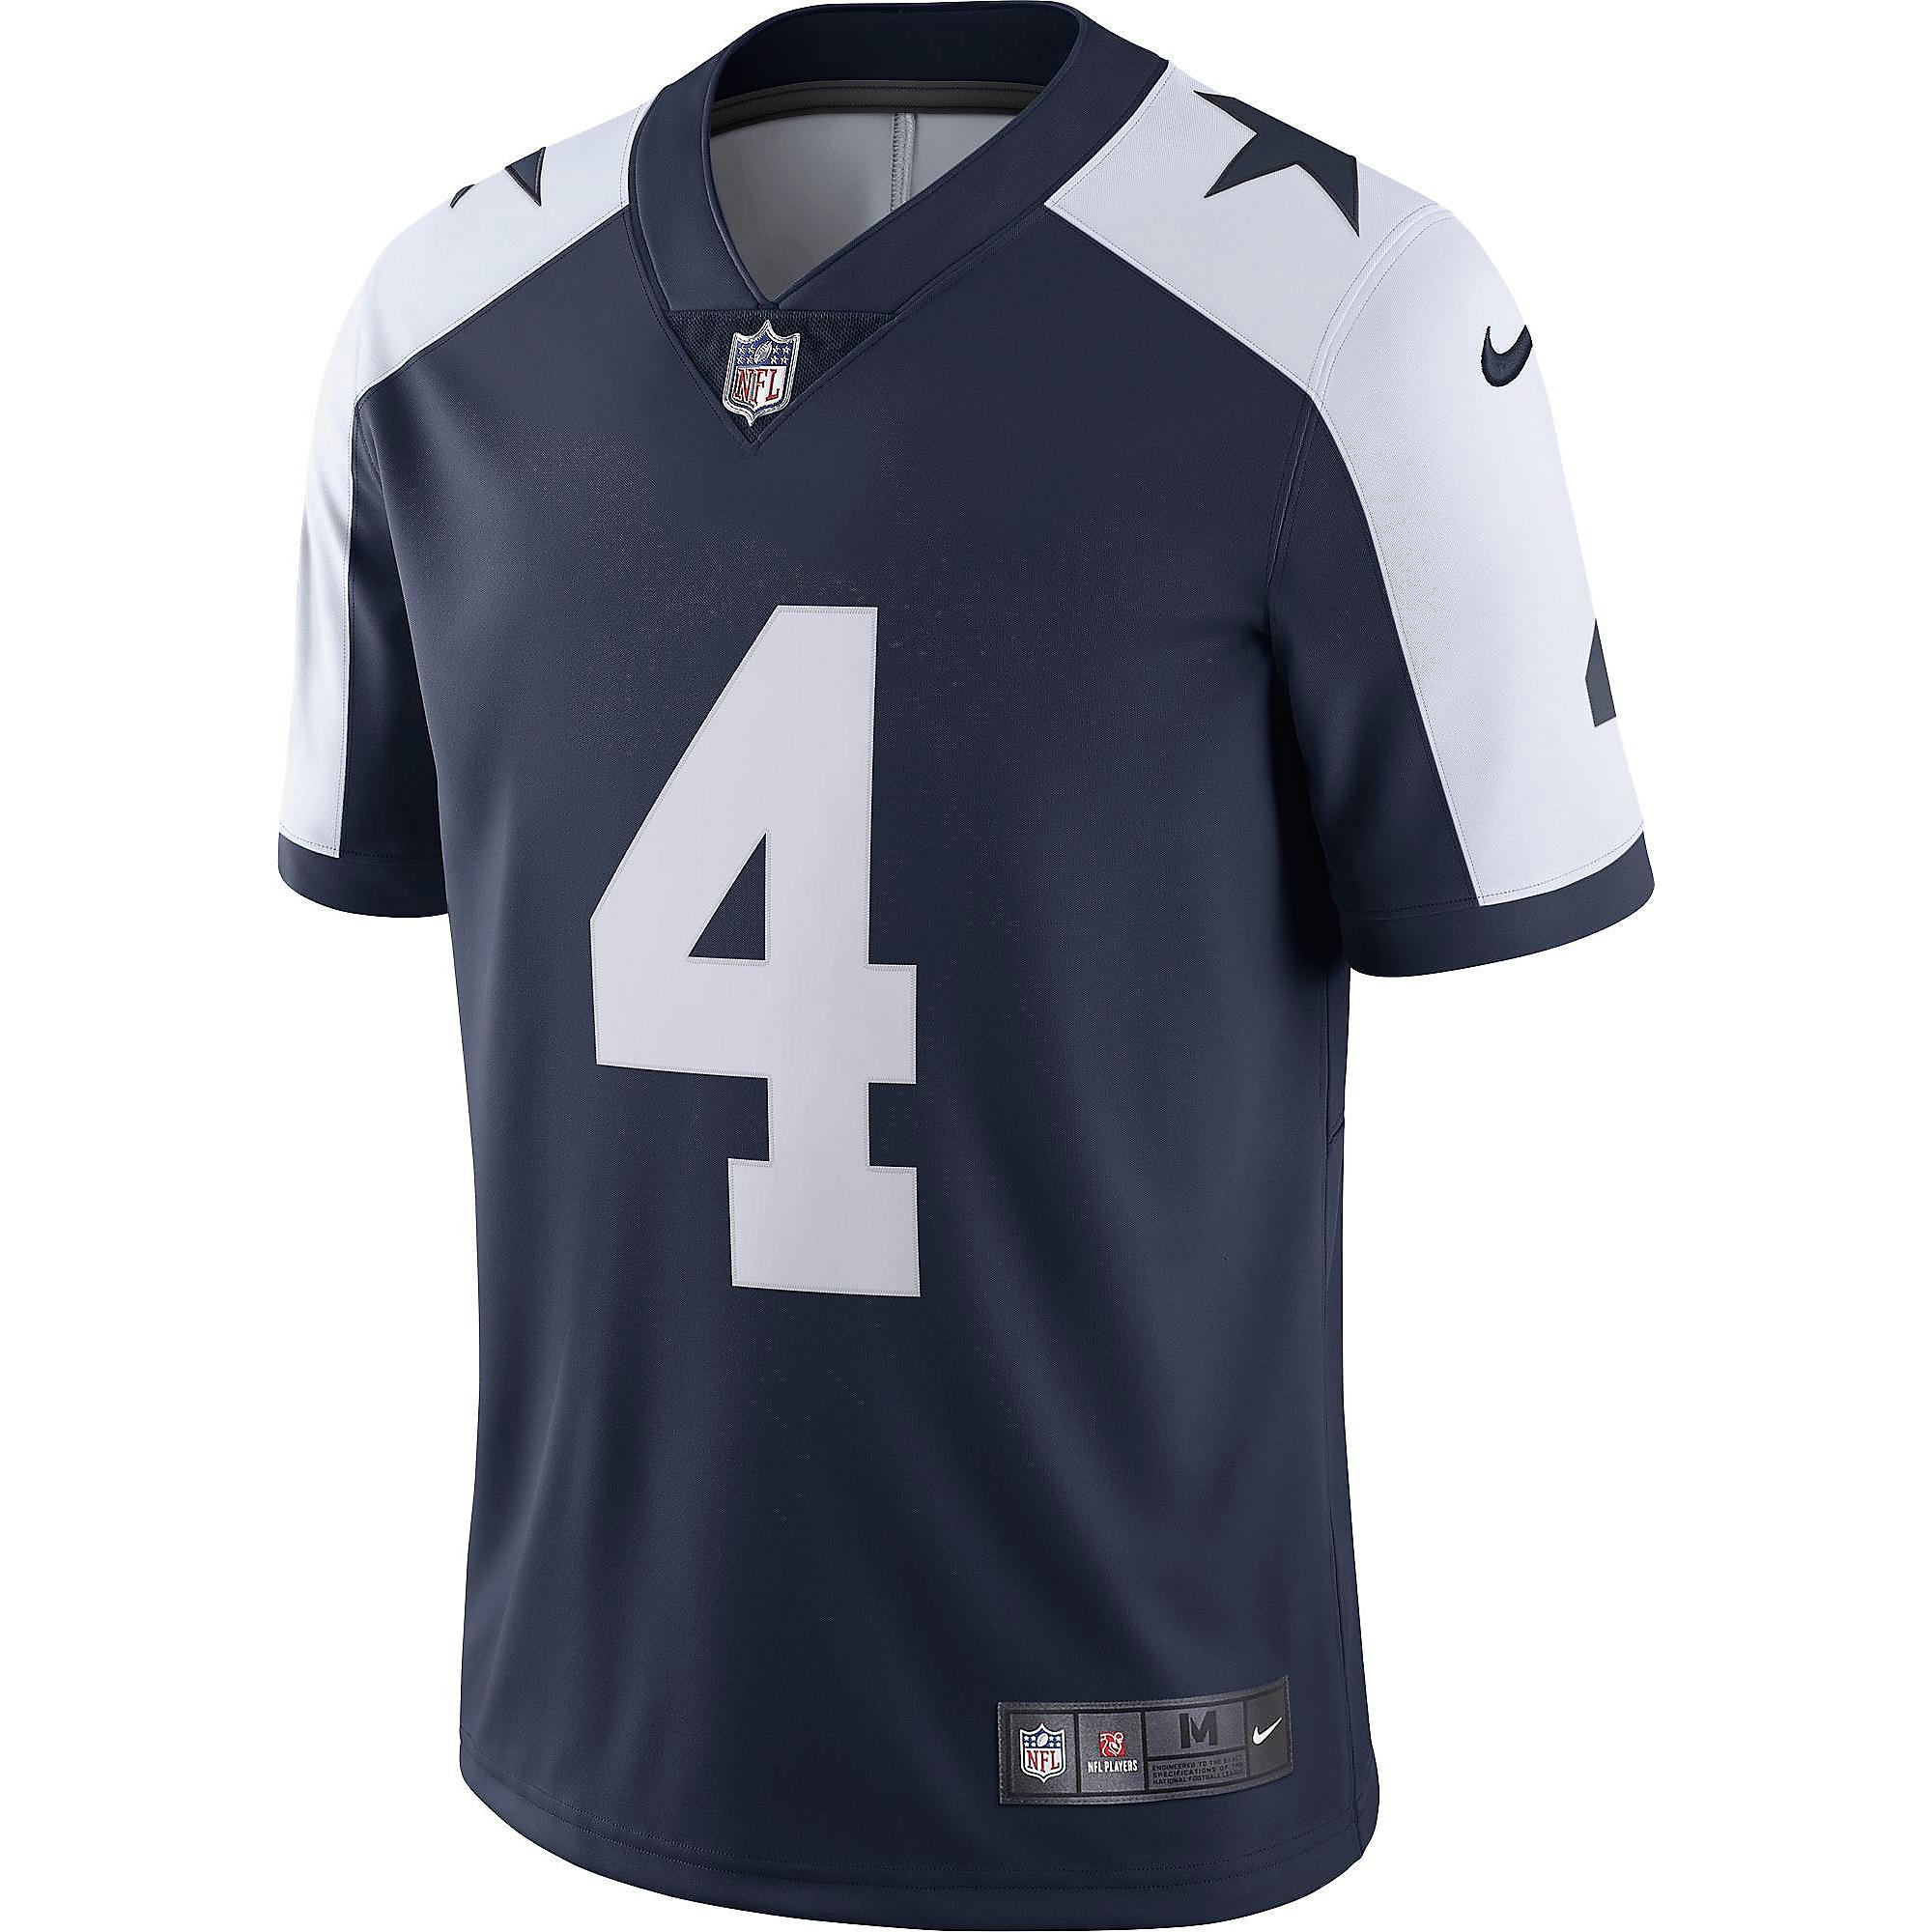 9c9329bed ... Dallas Cowboys Dak Prescott #4 Nike Vapor Untouchable Limited Throwback  Jersey ...